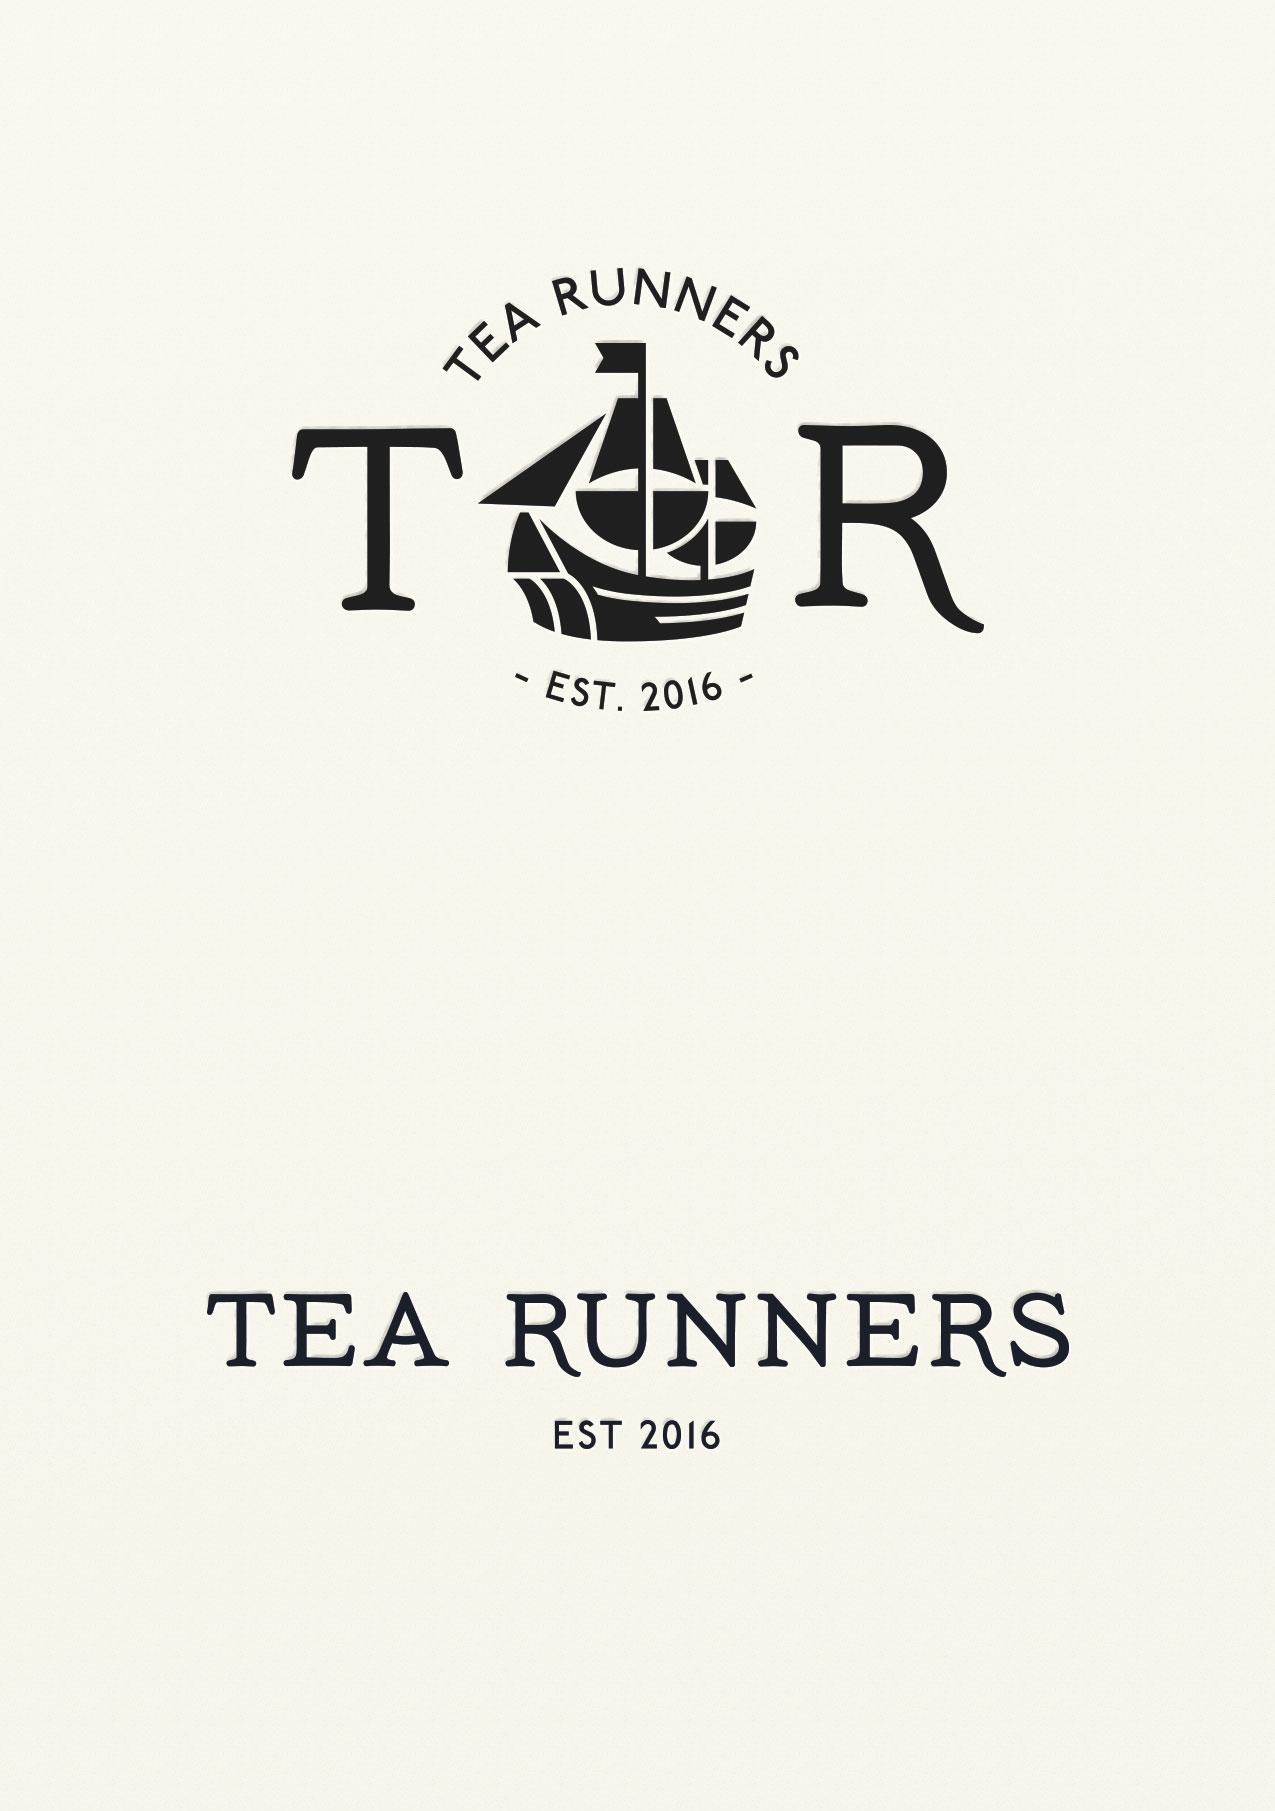 tea-runners-logos